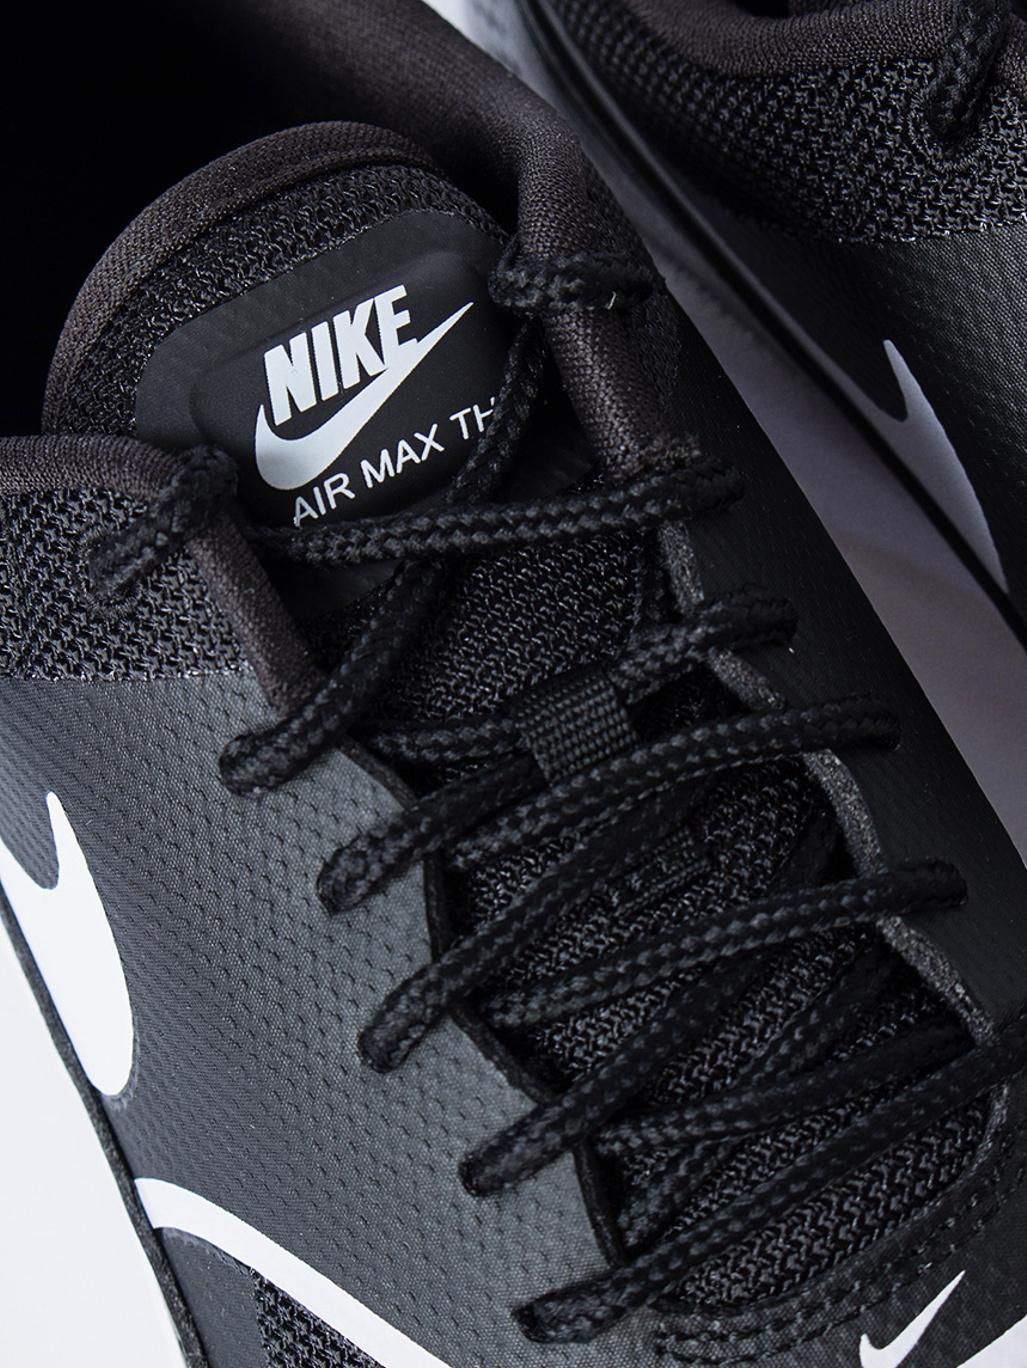 new style 68706 cb2ac Nike Air Max Thea Black  White - Nike